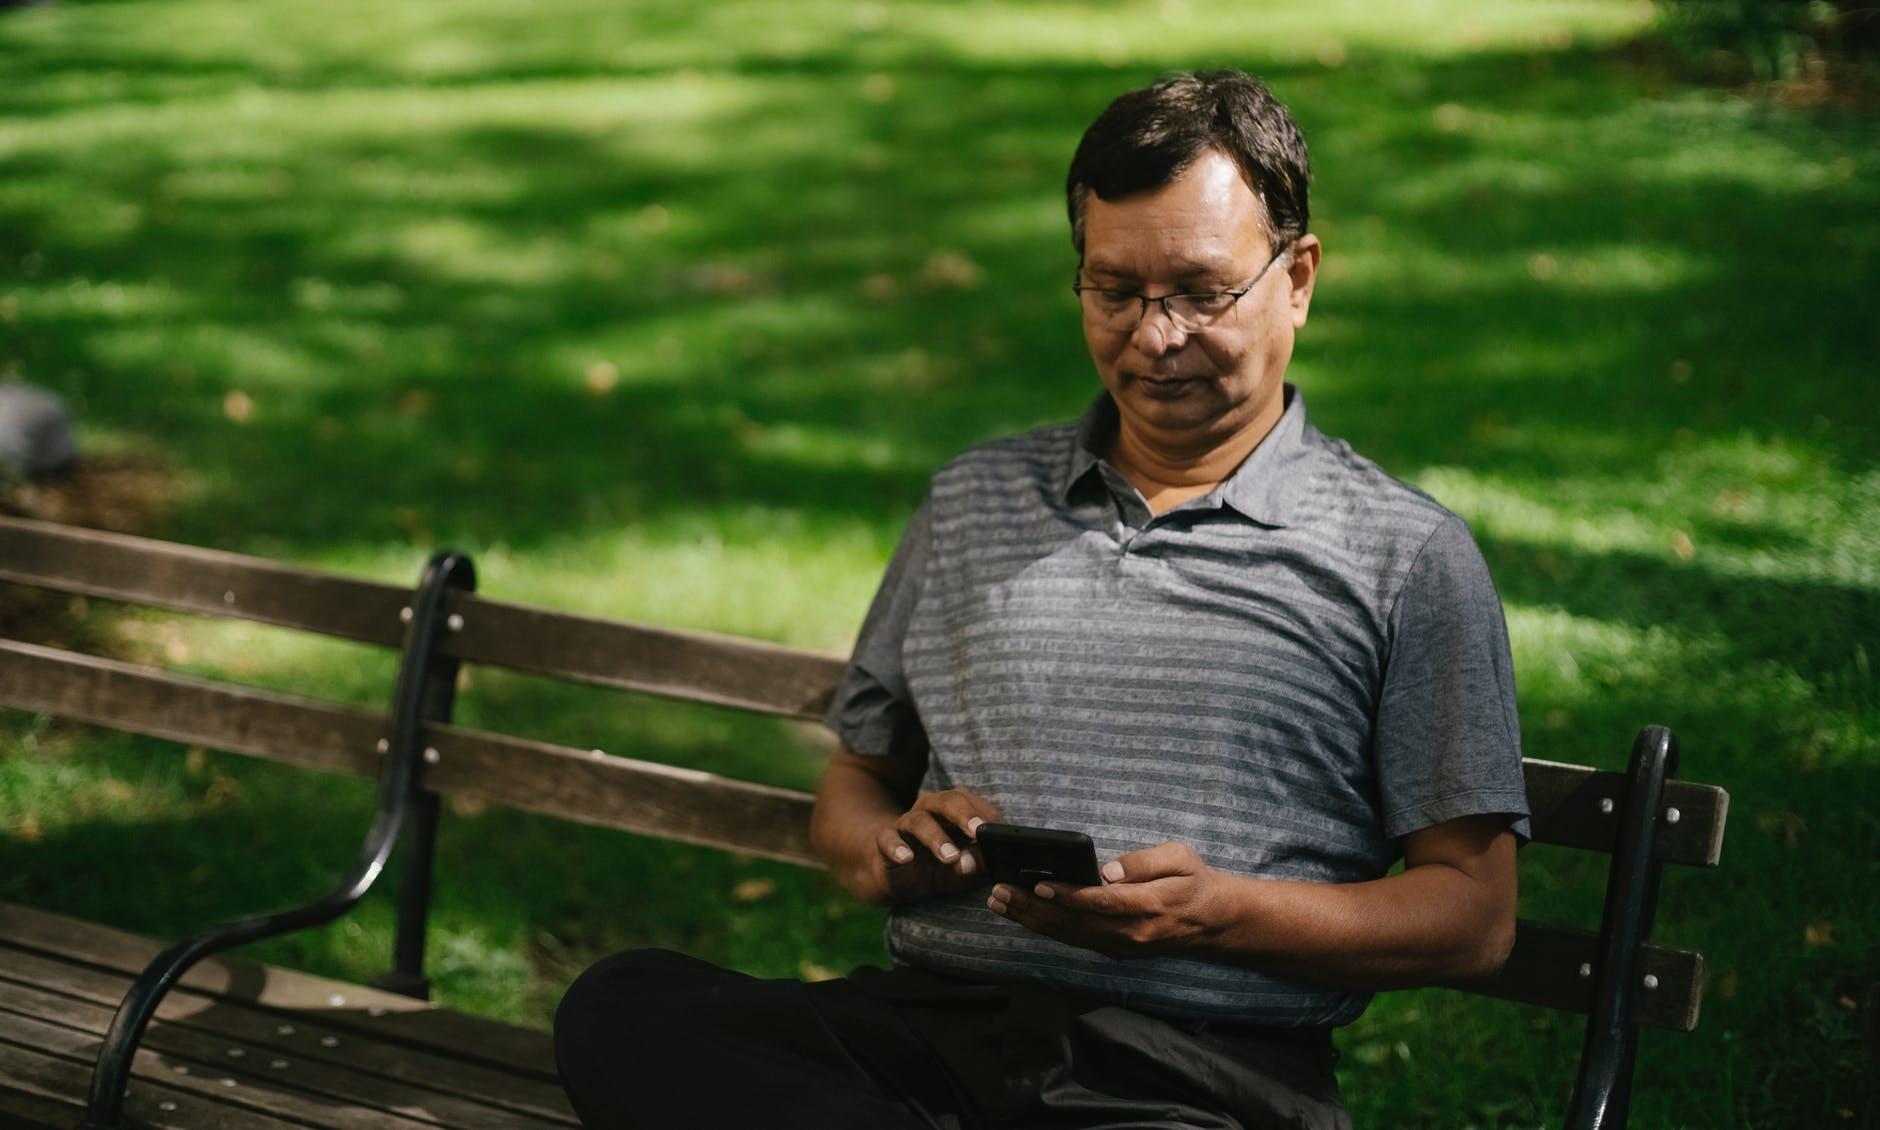 man surfing net sitting on bench